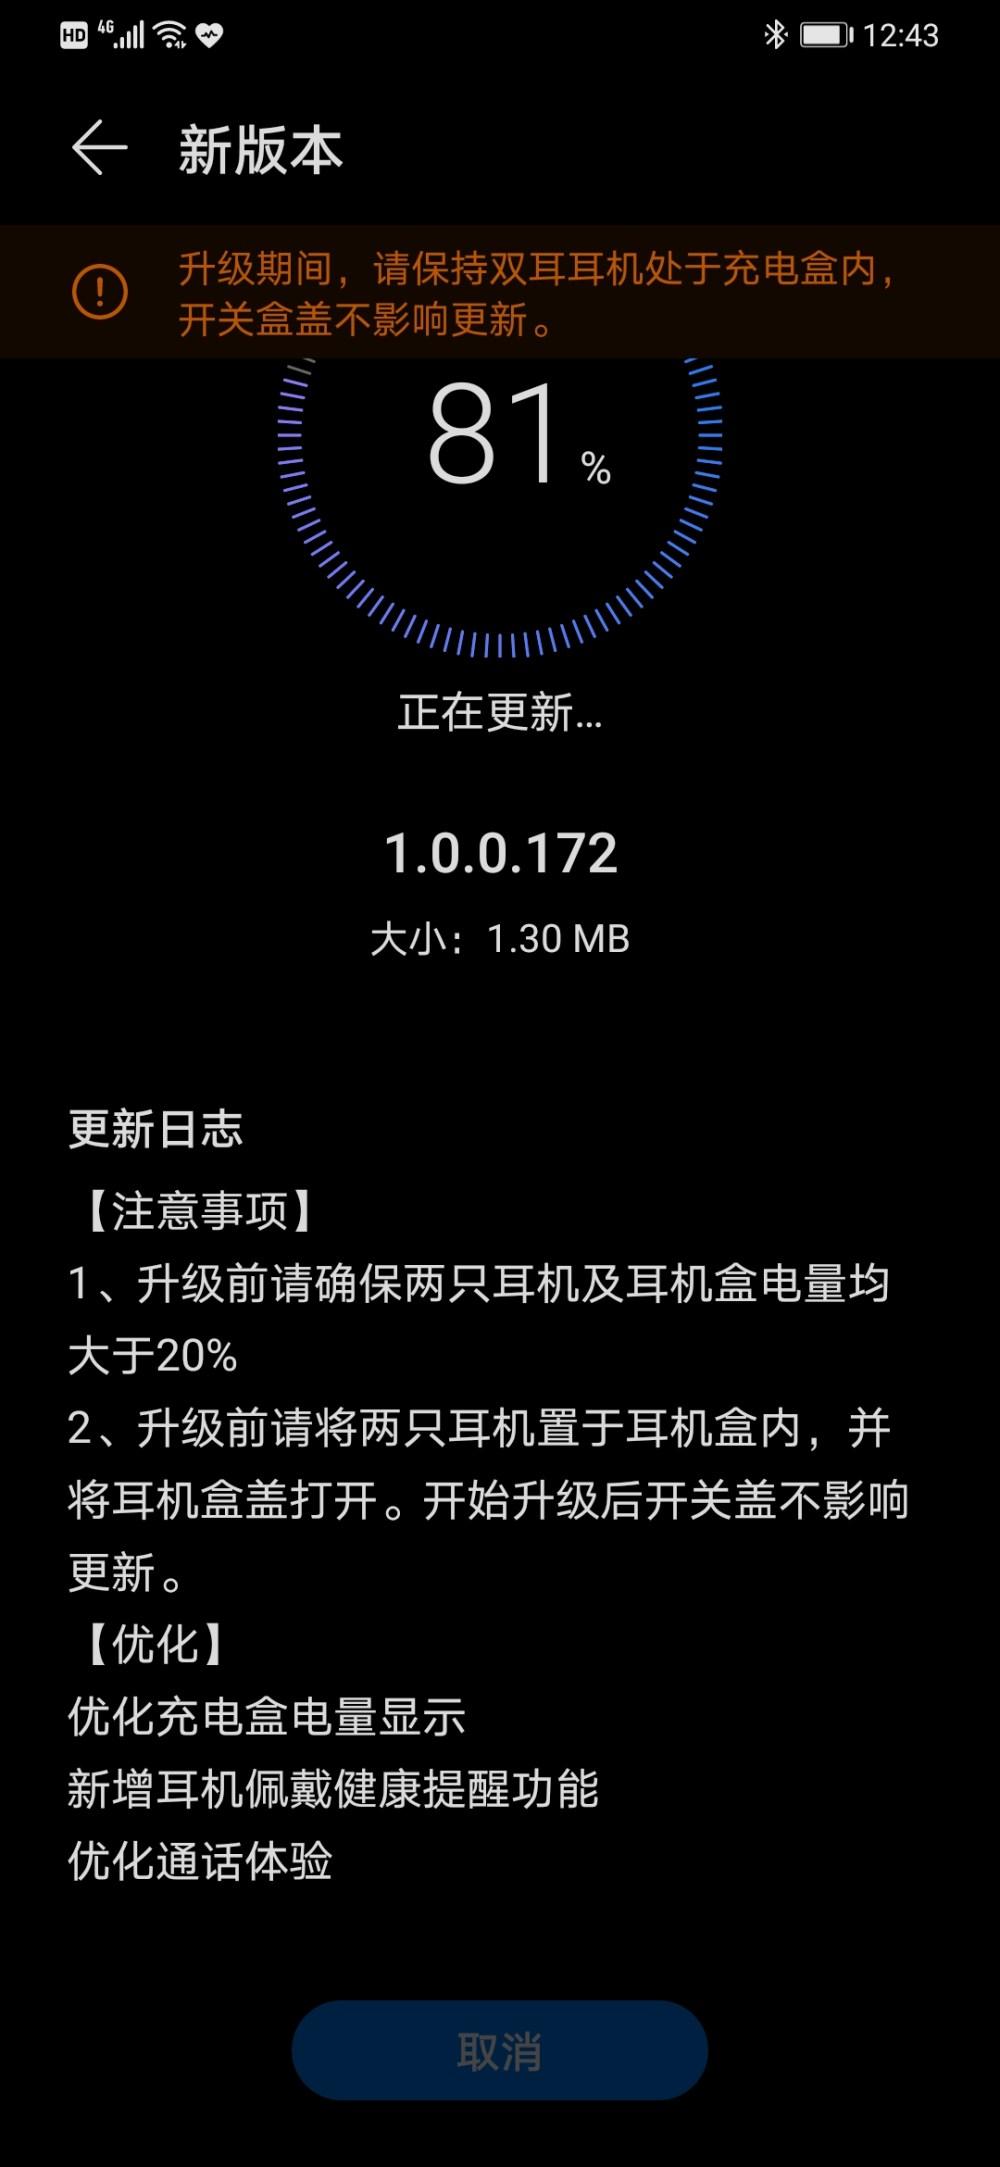 Huawei Freebuds 4i Update Version 1.0.0.172